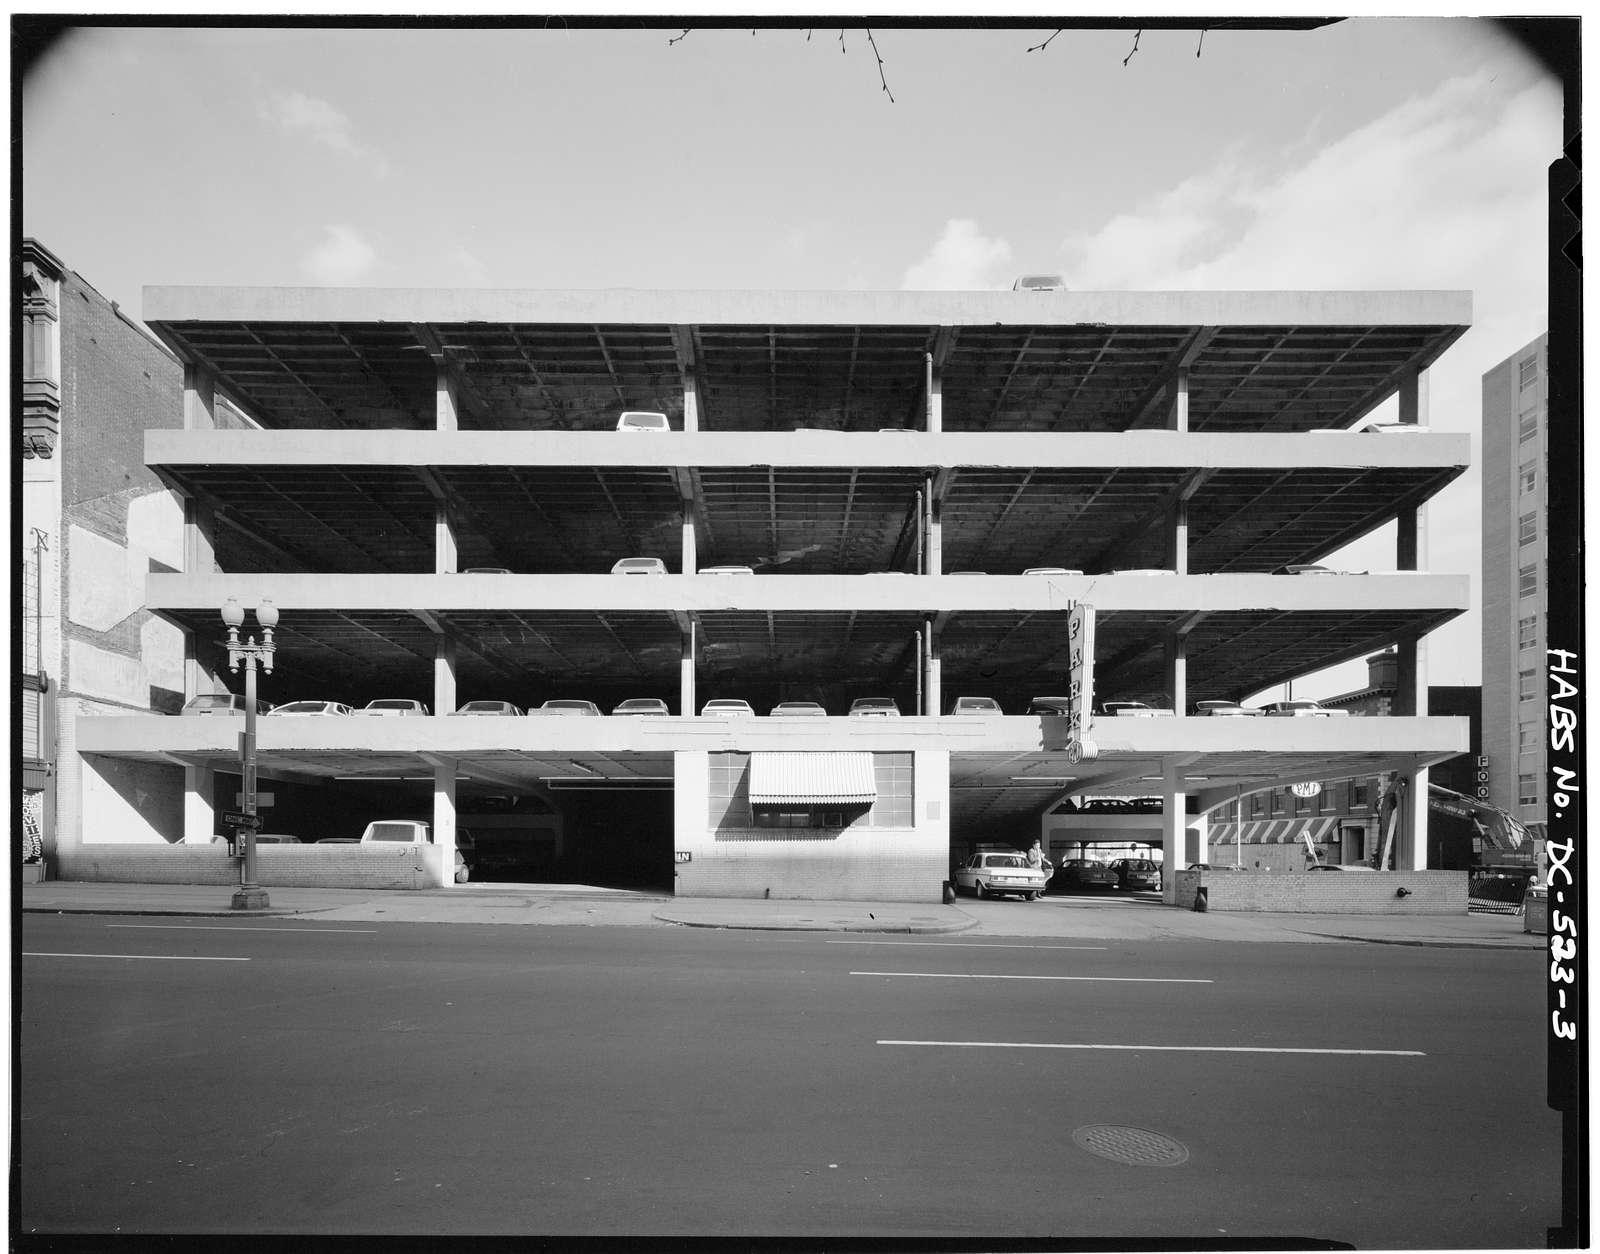 PMI Parking Garage, 403-407 Ninth Street, Northwest, Washington, District of Columbia, DC